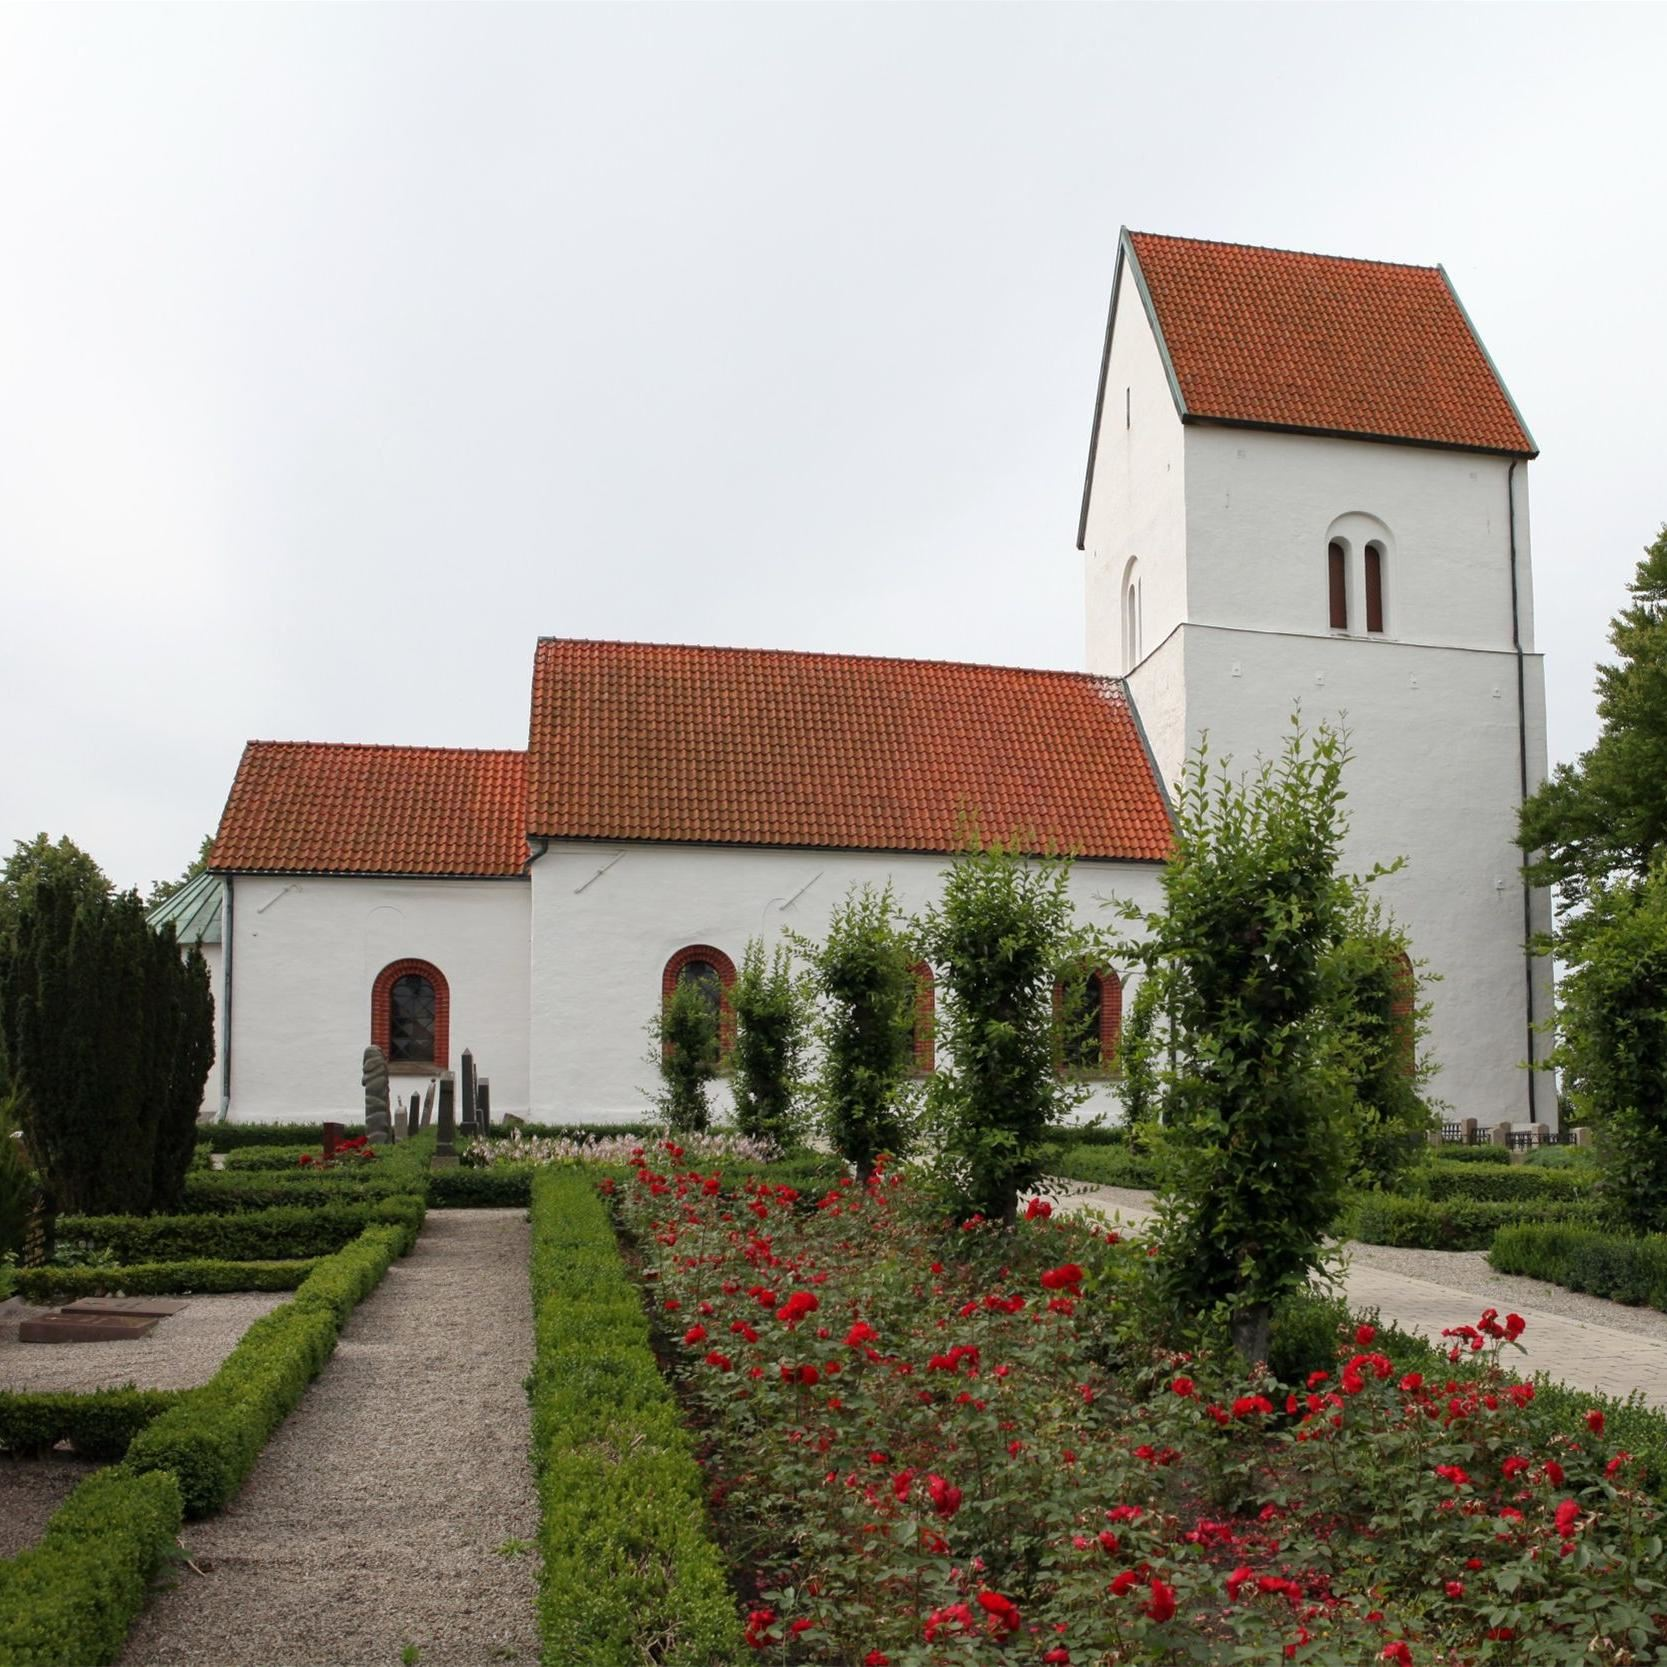 © Kävlinge kommun, Lilla Harrie kyrka